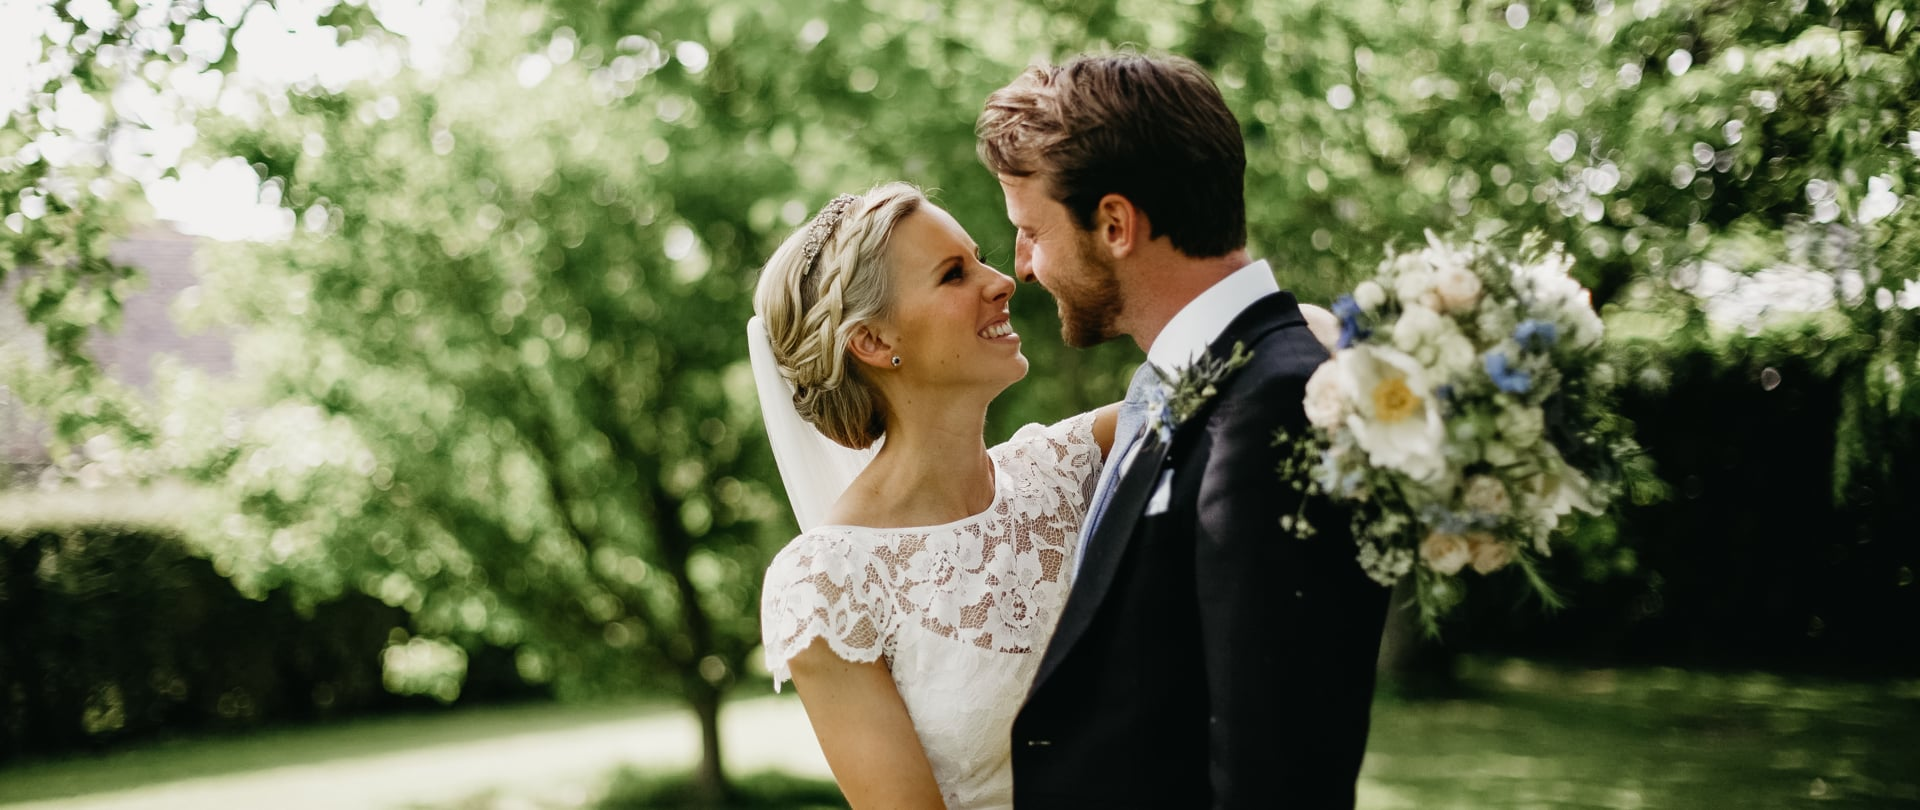 Georgina & Robbie Wedding Video Filmed at Kent, England